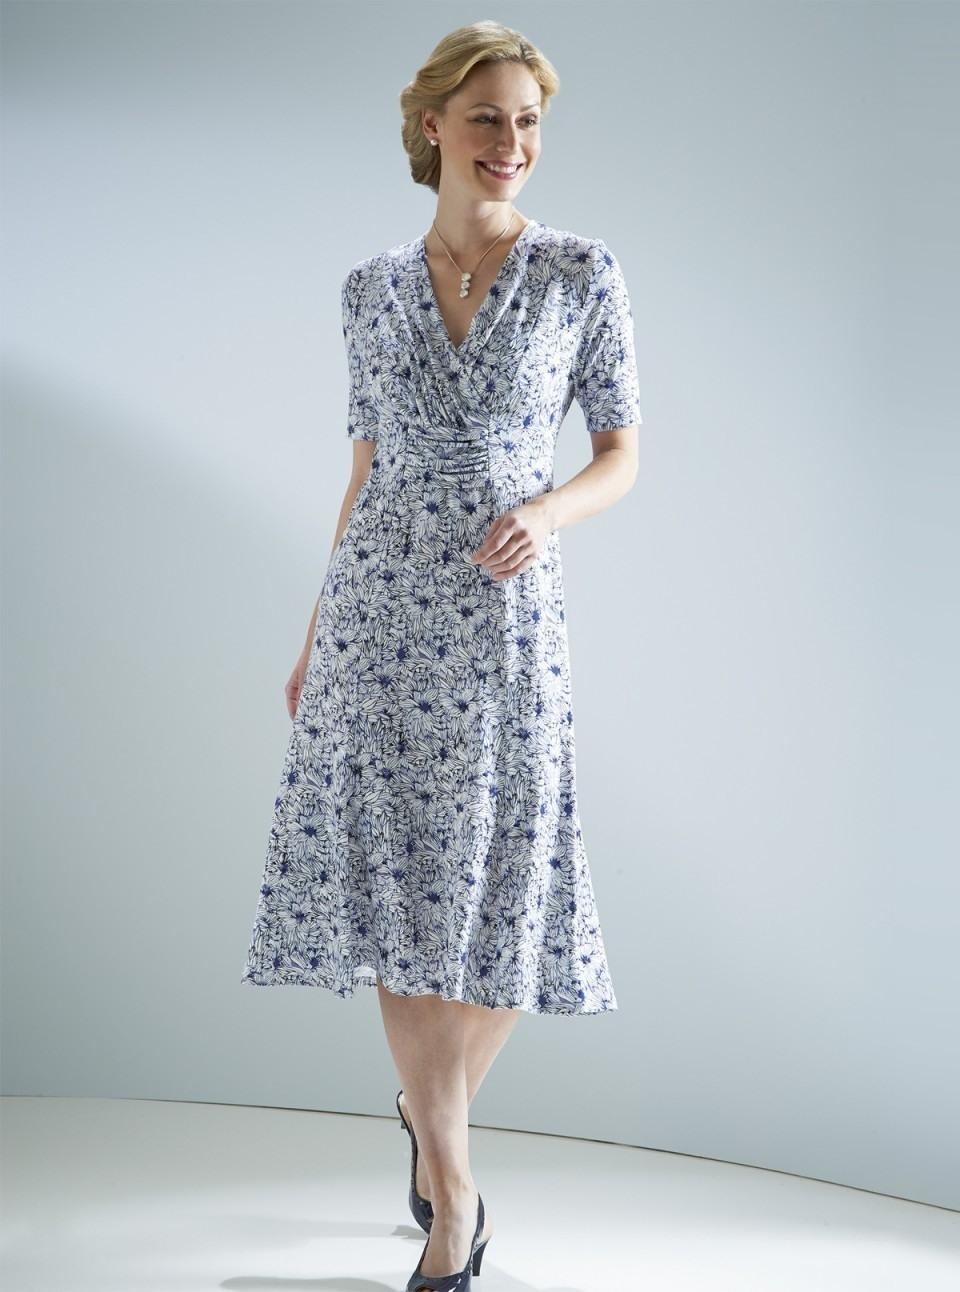 20 Genial Kleider Zum Besonderen Anlass VertriebFormal Fantastisch Kleider Zum Besonderen Anlass Vertrieb